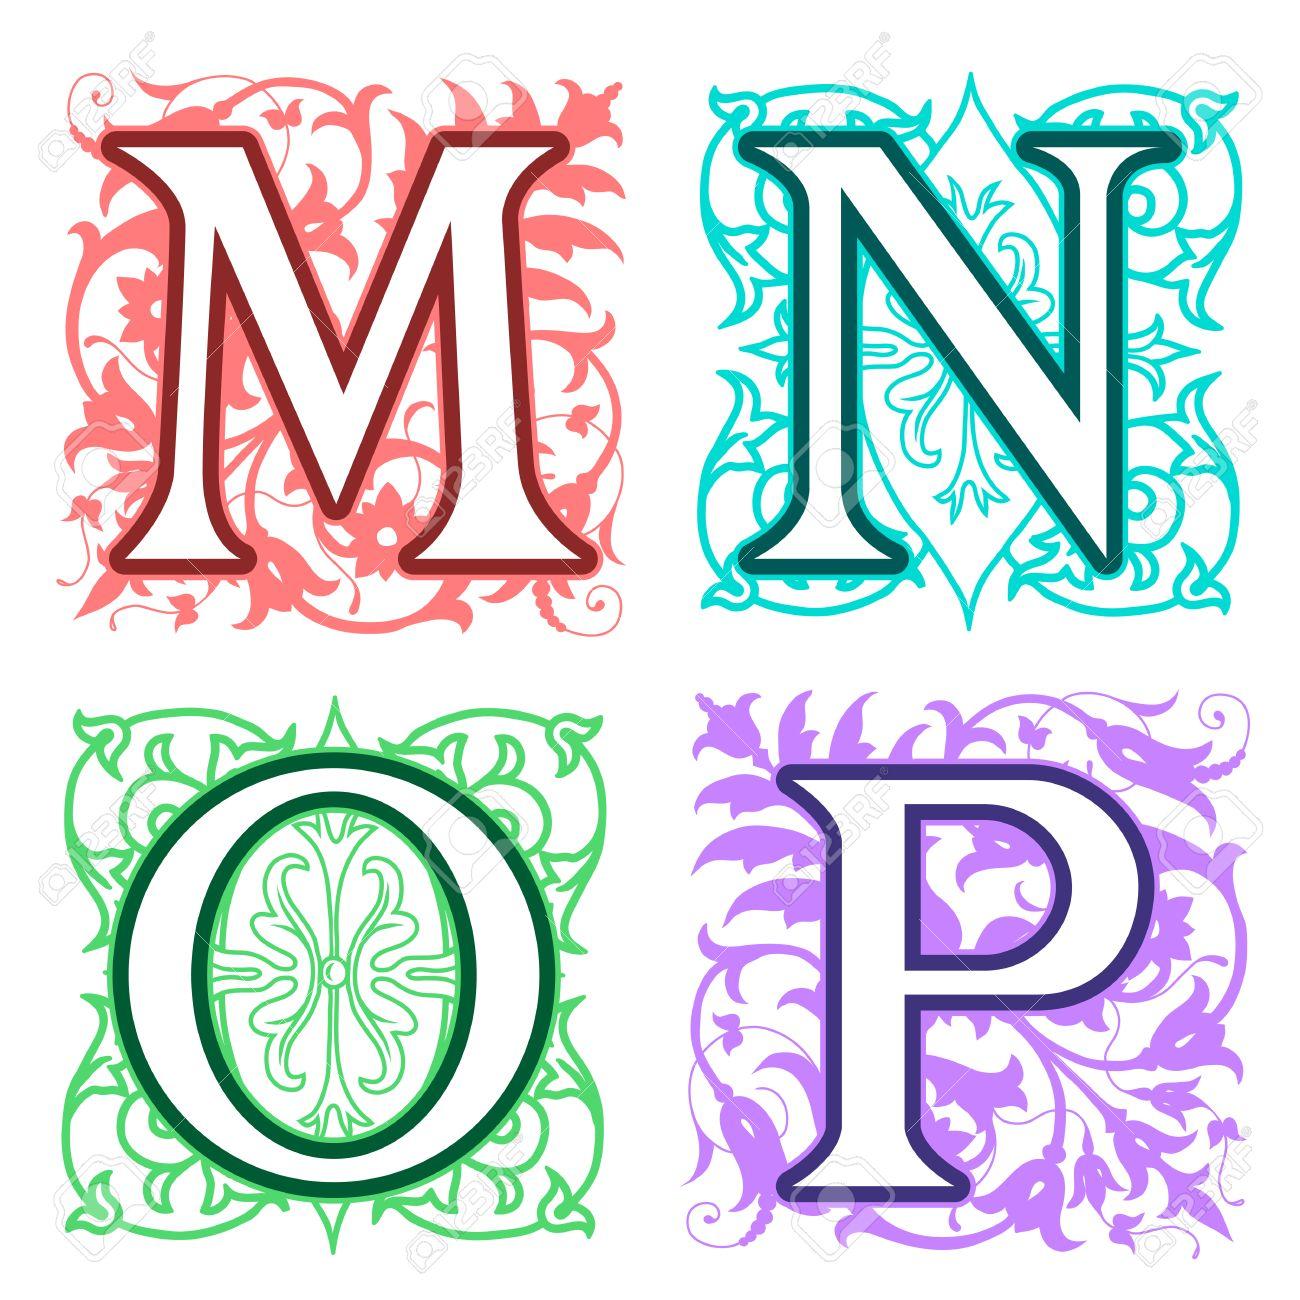 Decorative M N O P Alphabet Letters With Vintage Floral Elements